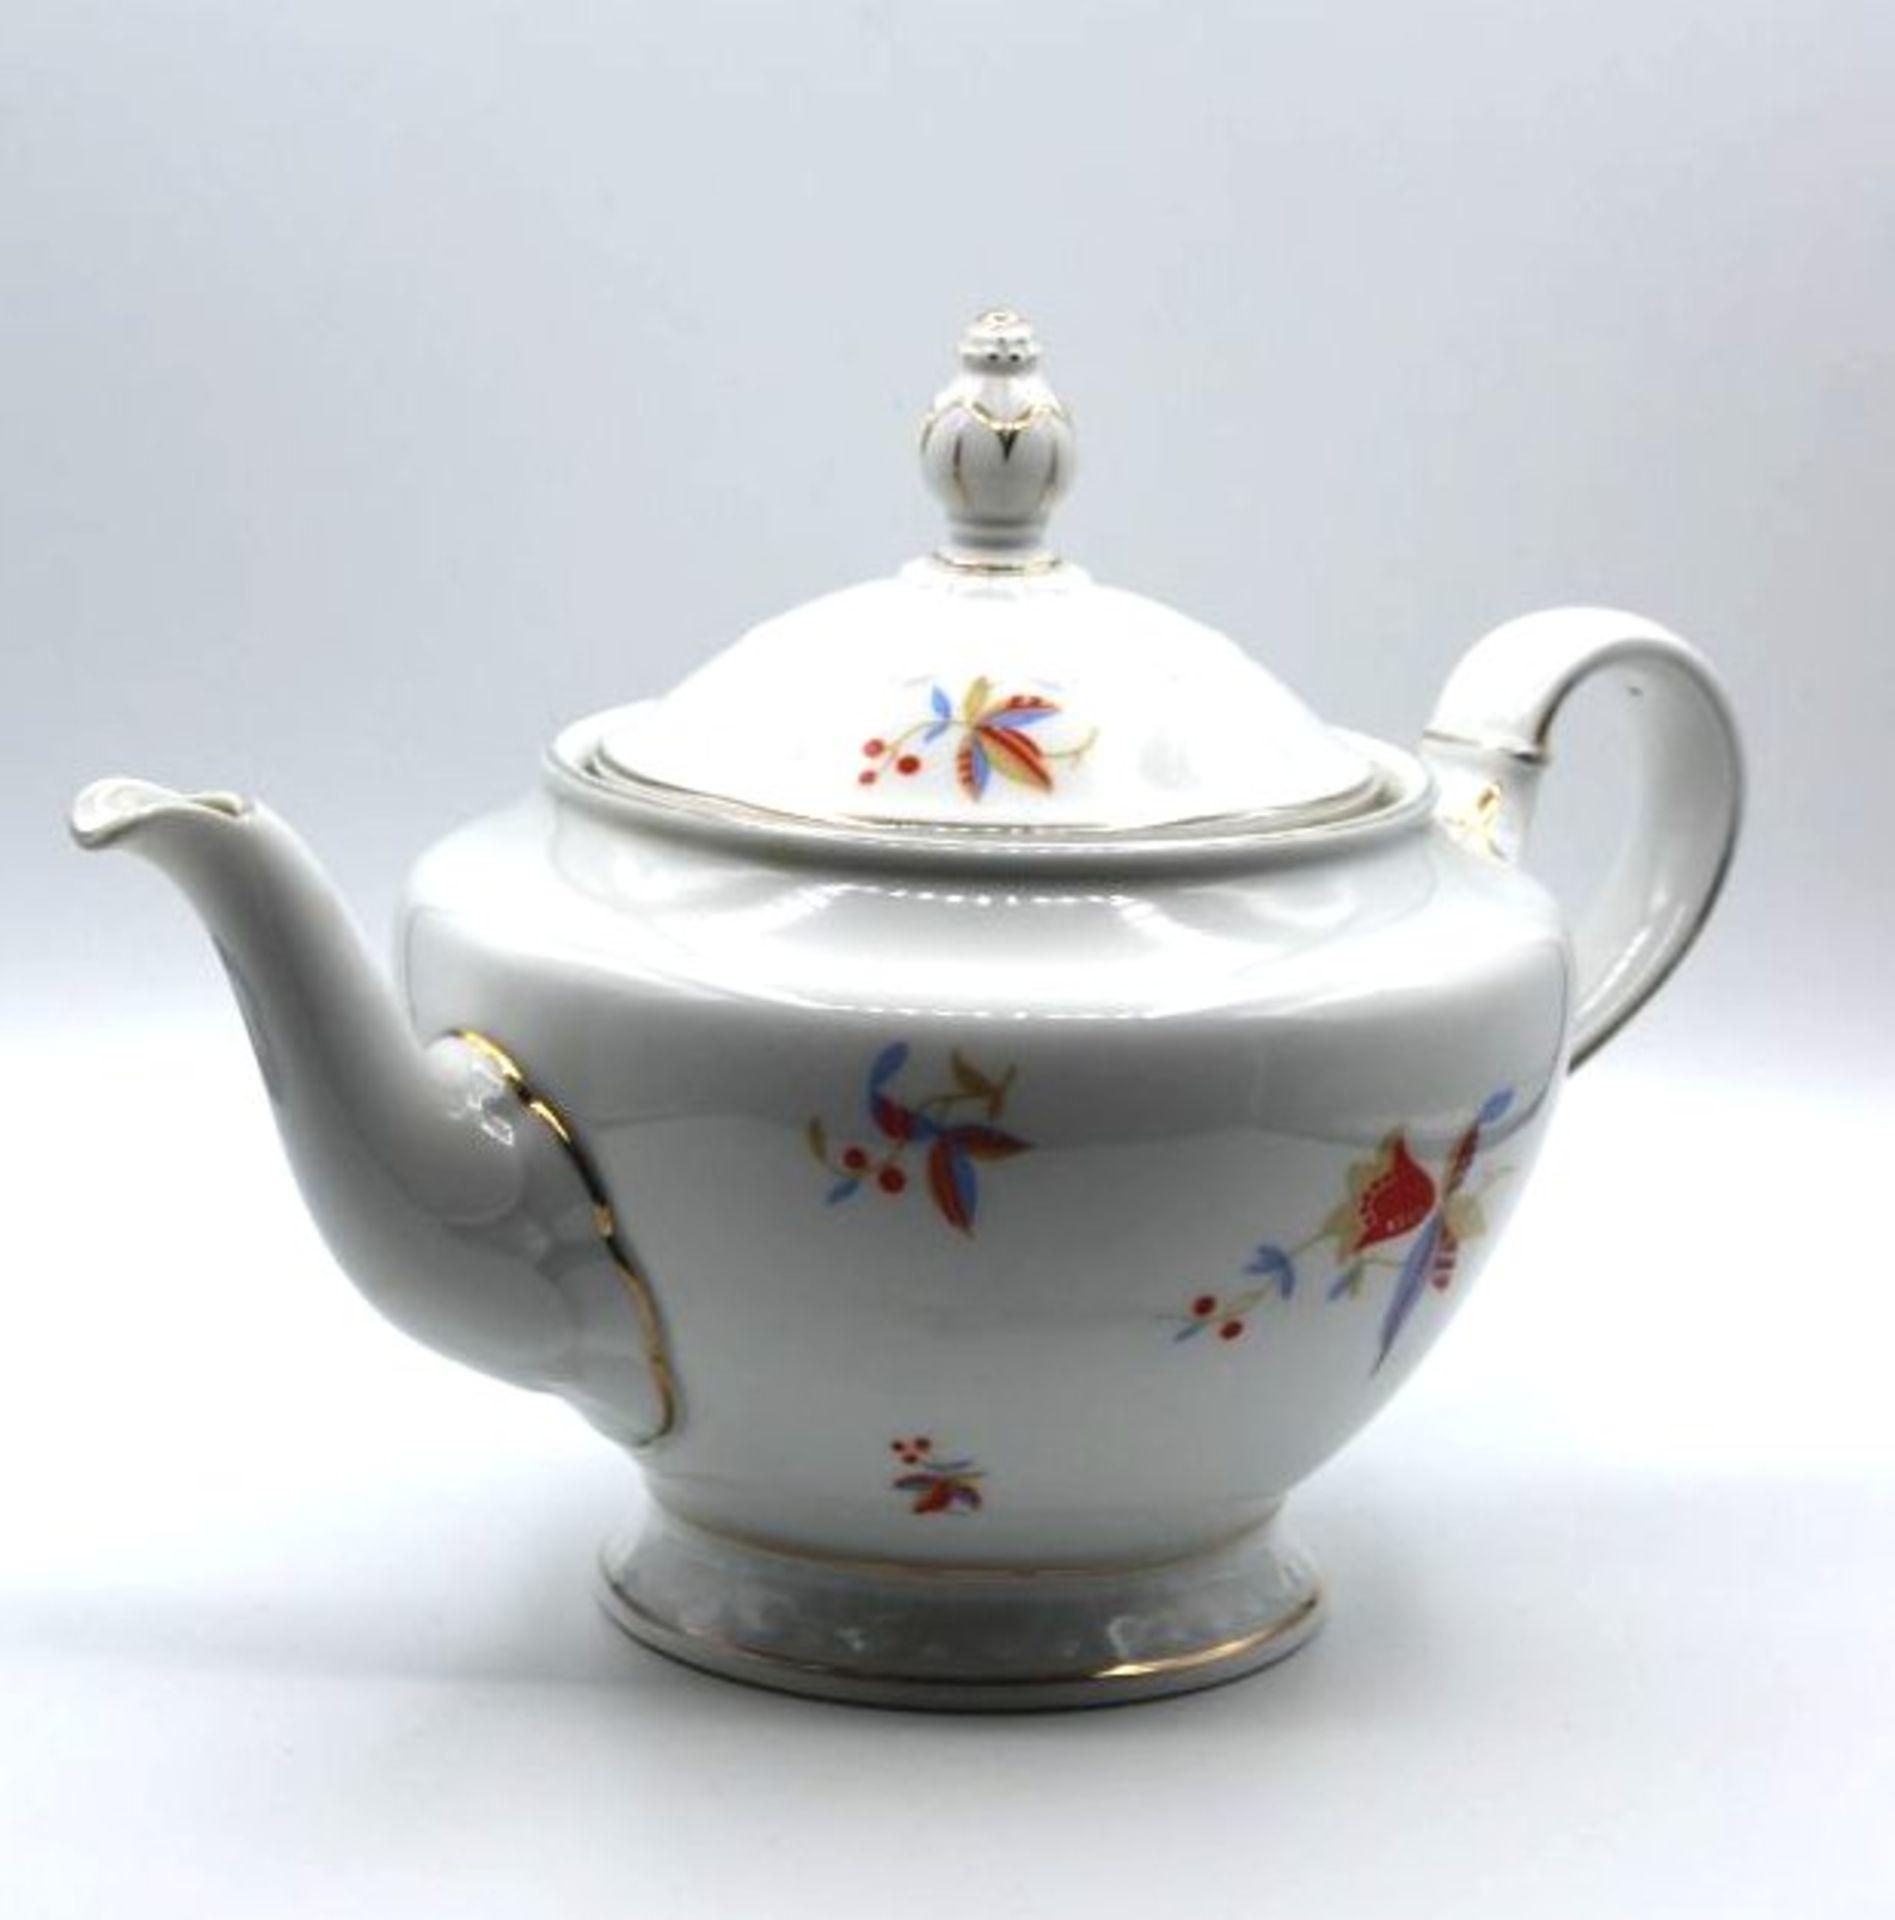 Teekanne, Rosenthal Empire, Art-Déco Dekor, H-18cm.<